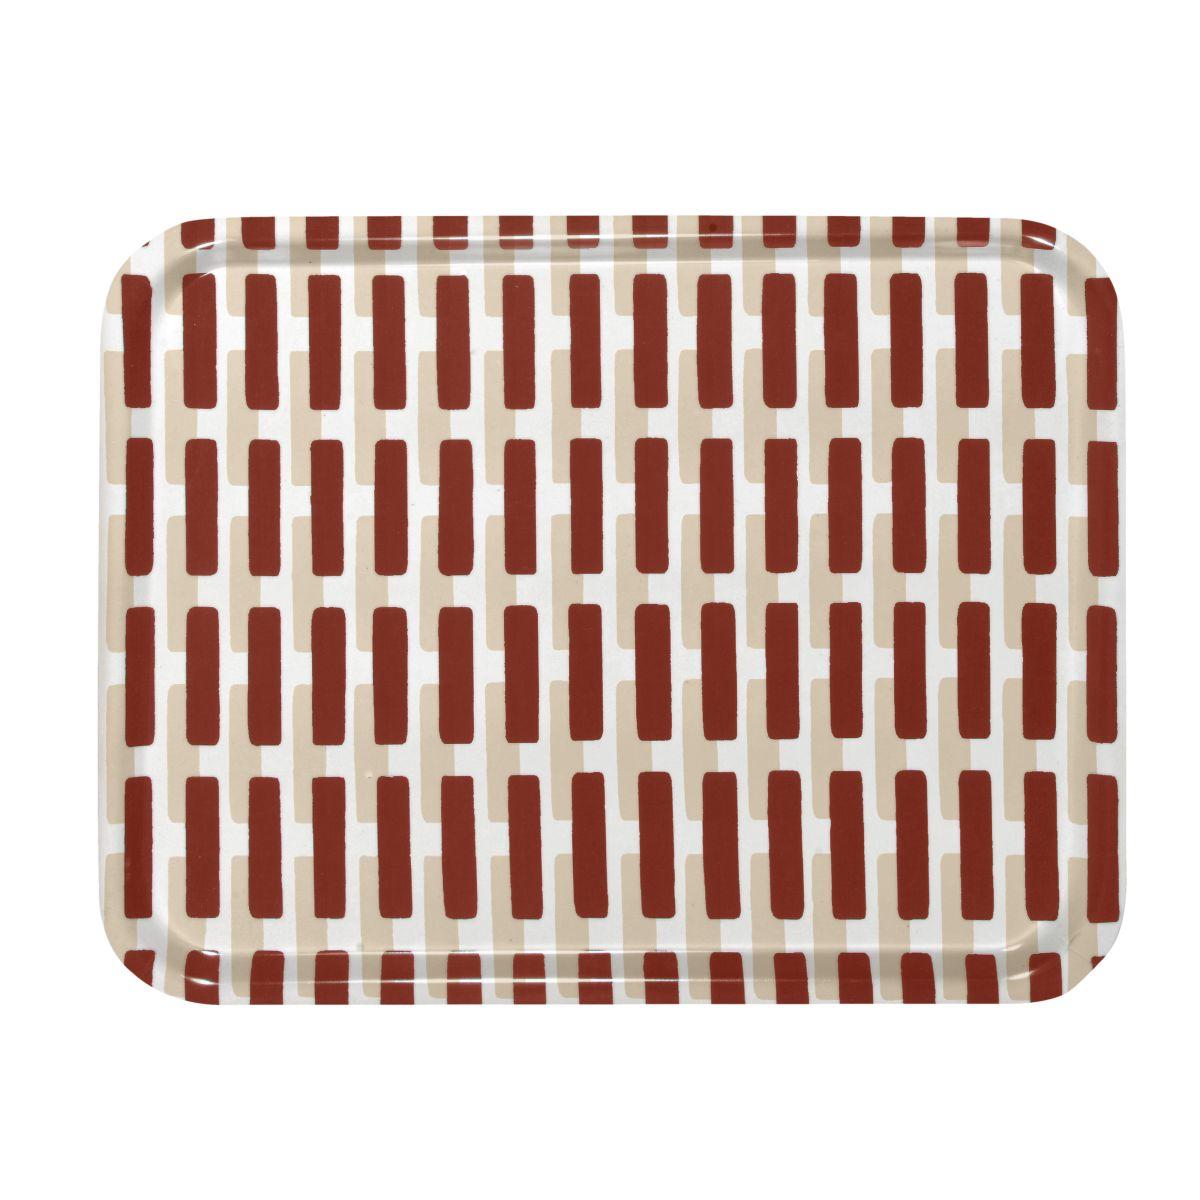 Siena-Tray-large-brick-sand-shadow-3976927